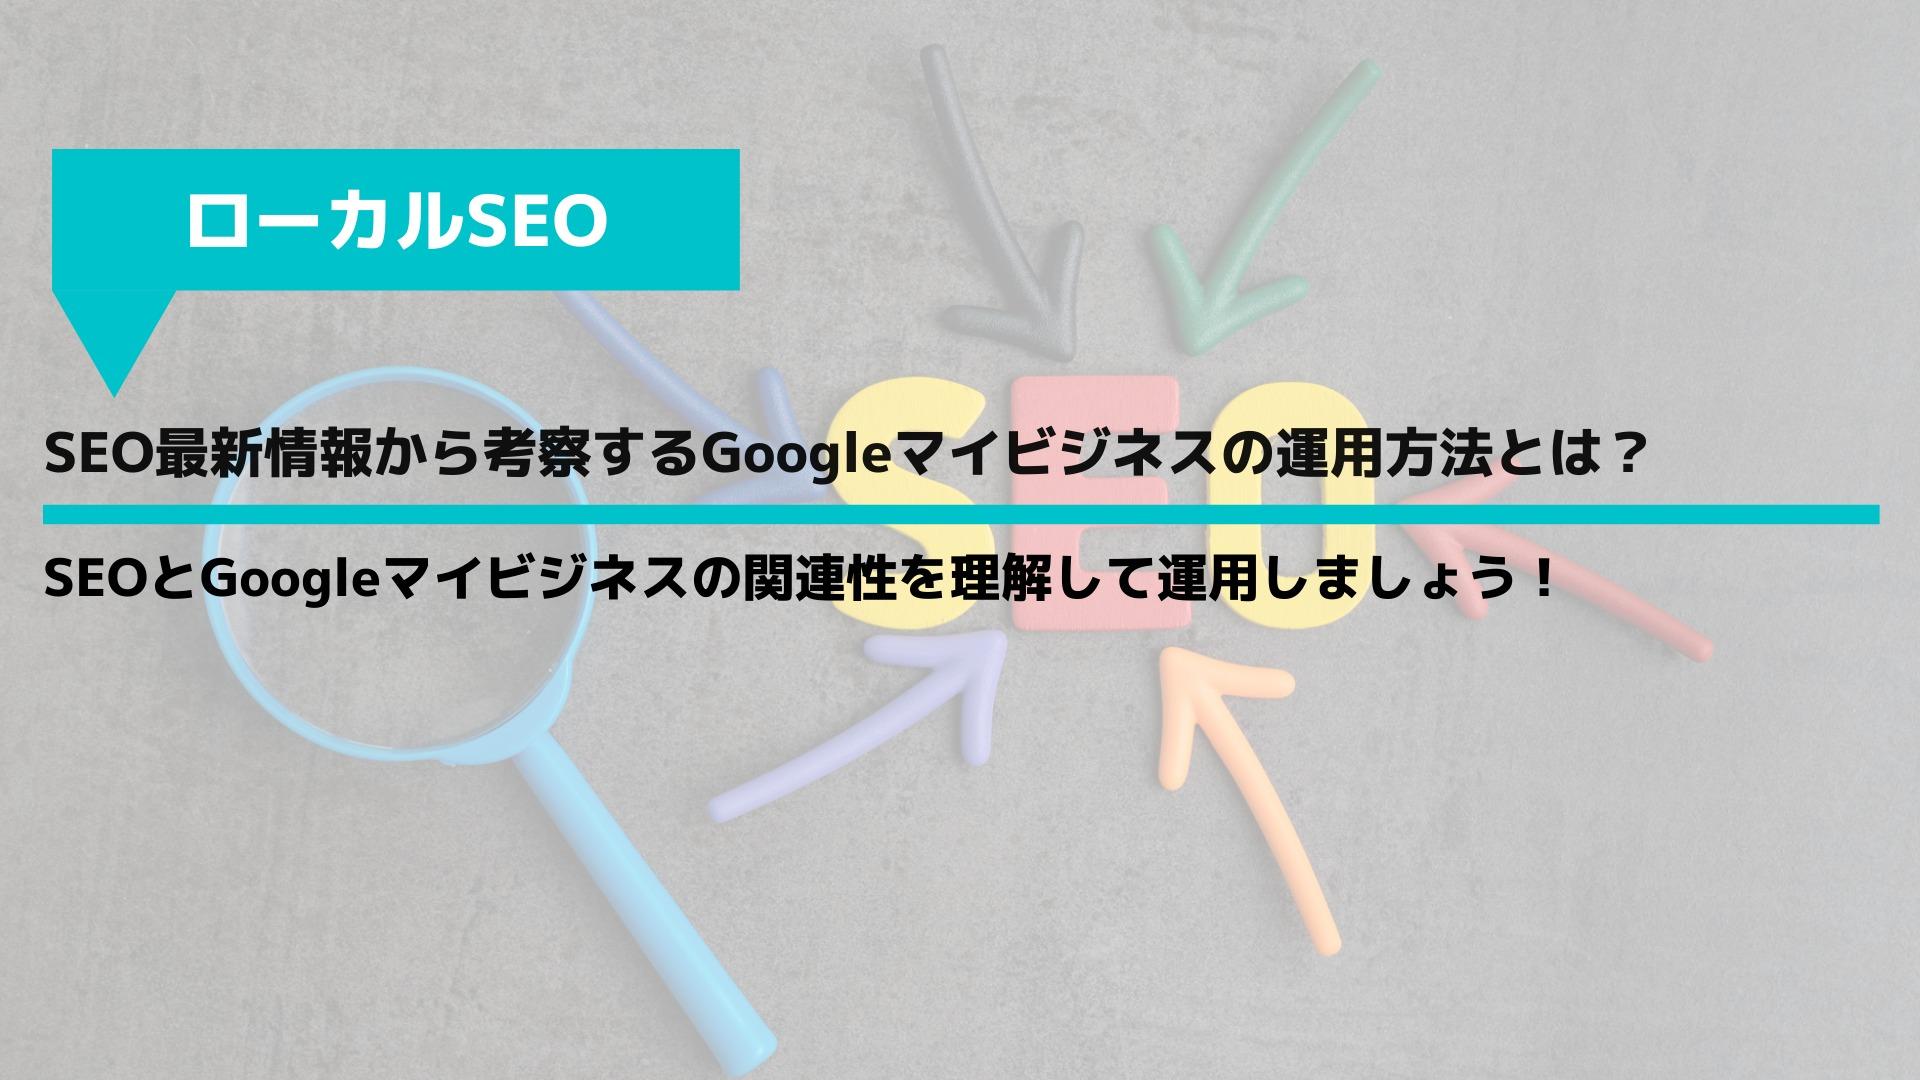 SEO最新情報から考察するGoogleマイビジネスの運用方法とは?